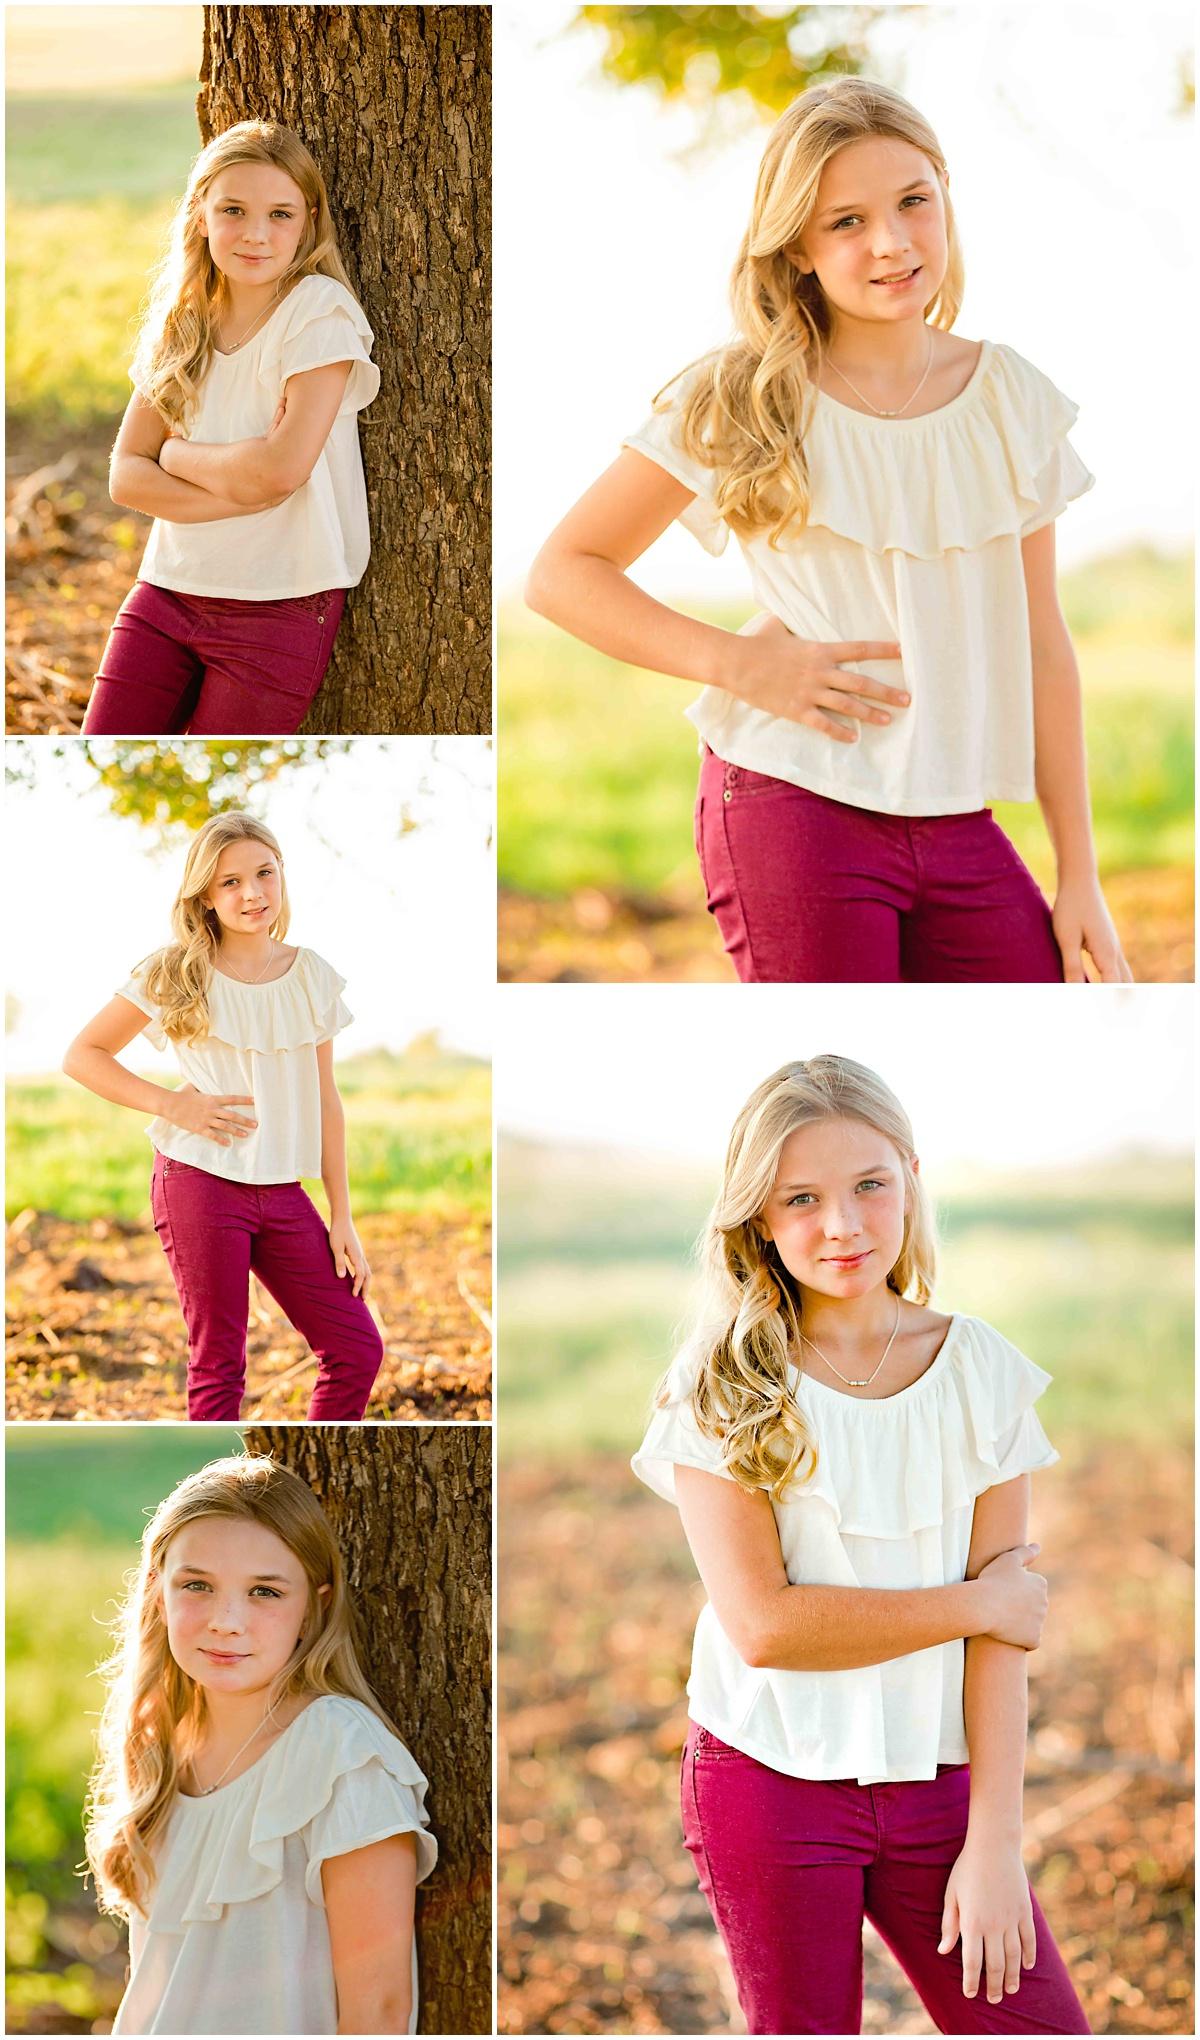 Family-Children-Maternity-Portraits-San-Antonio-Hill-Country-Texas-Carly-Barton-Photography_0025.jpg